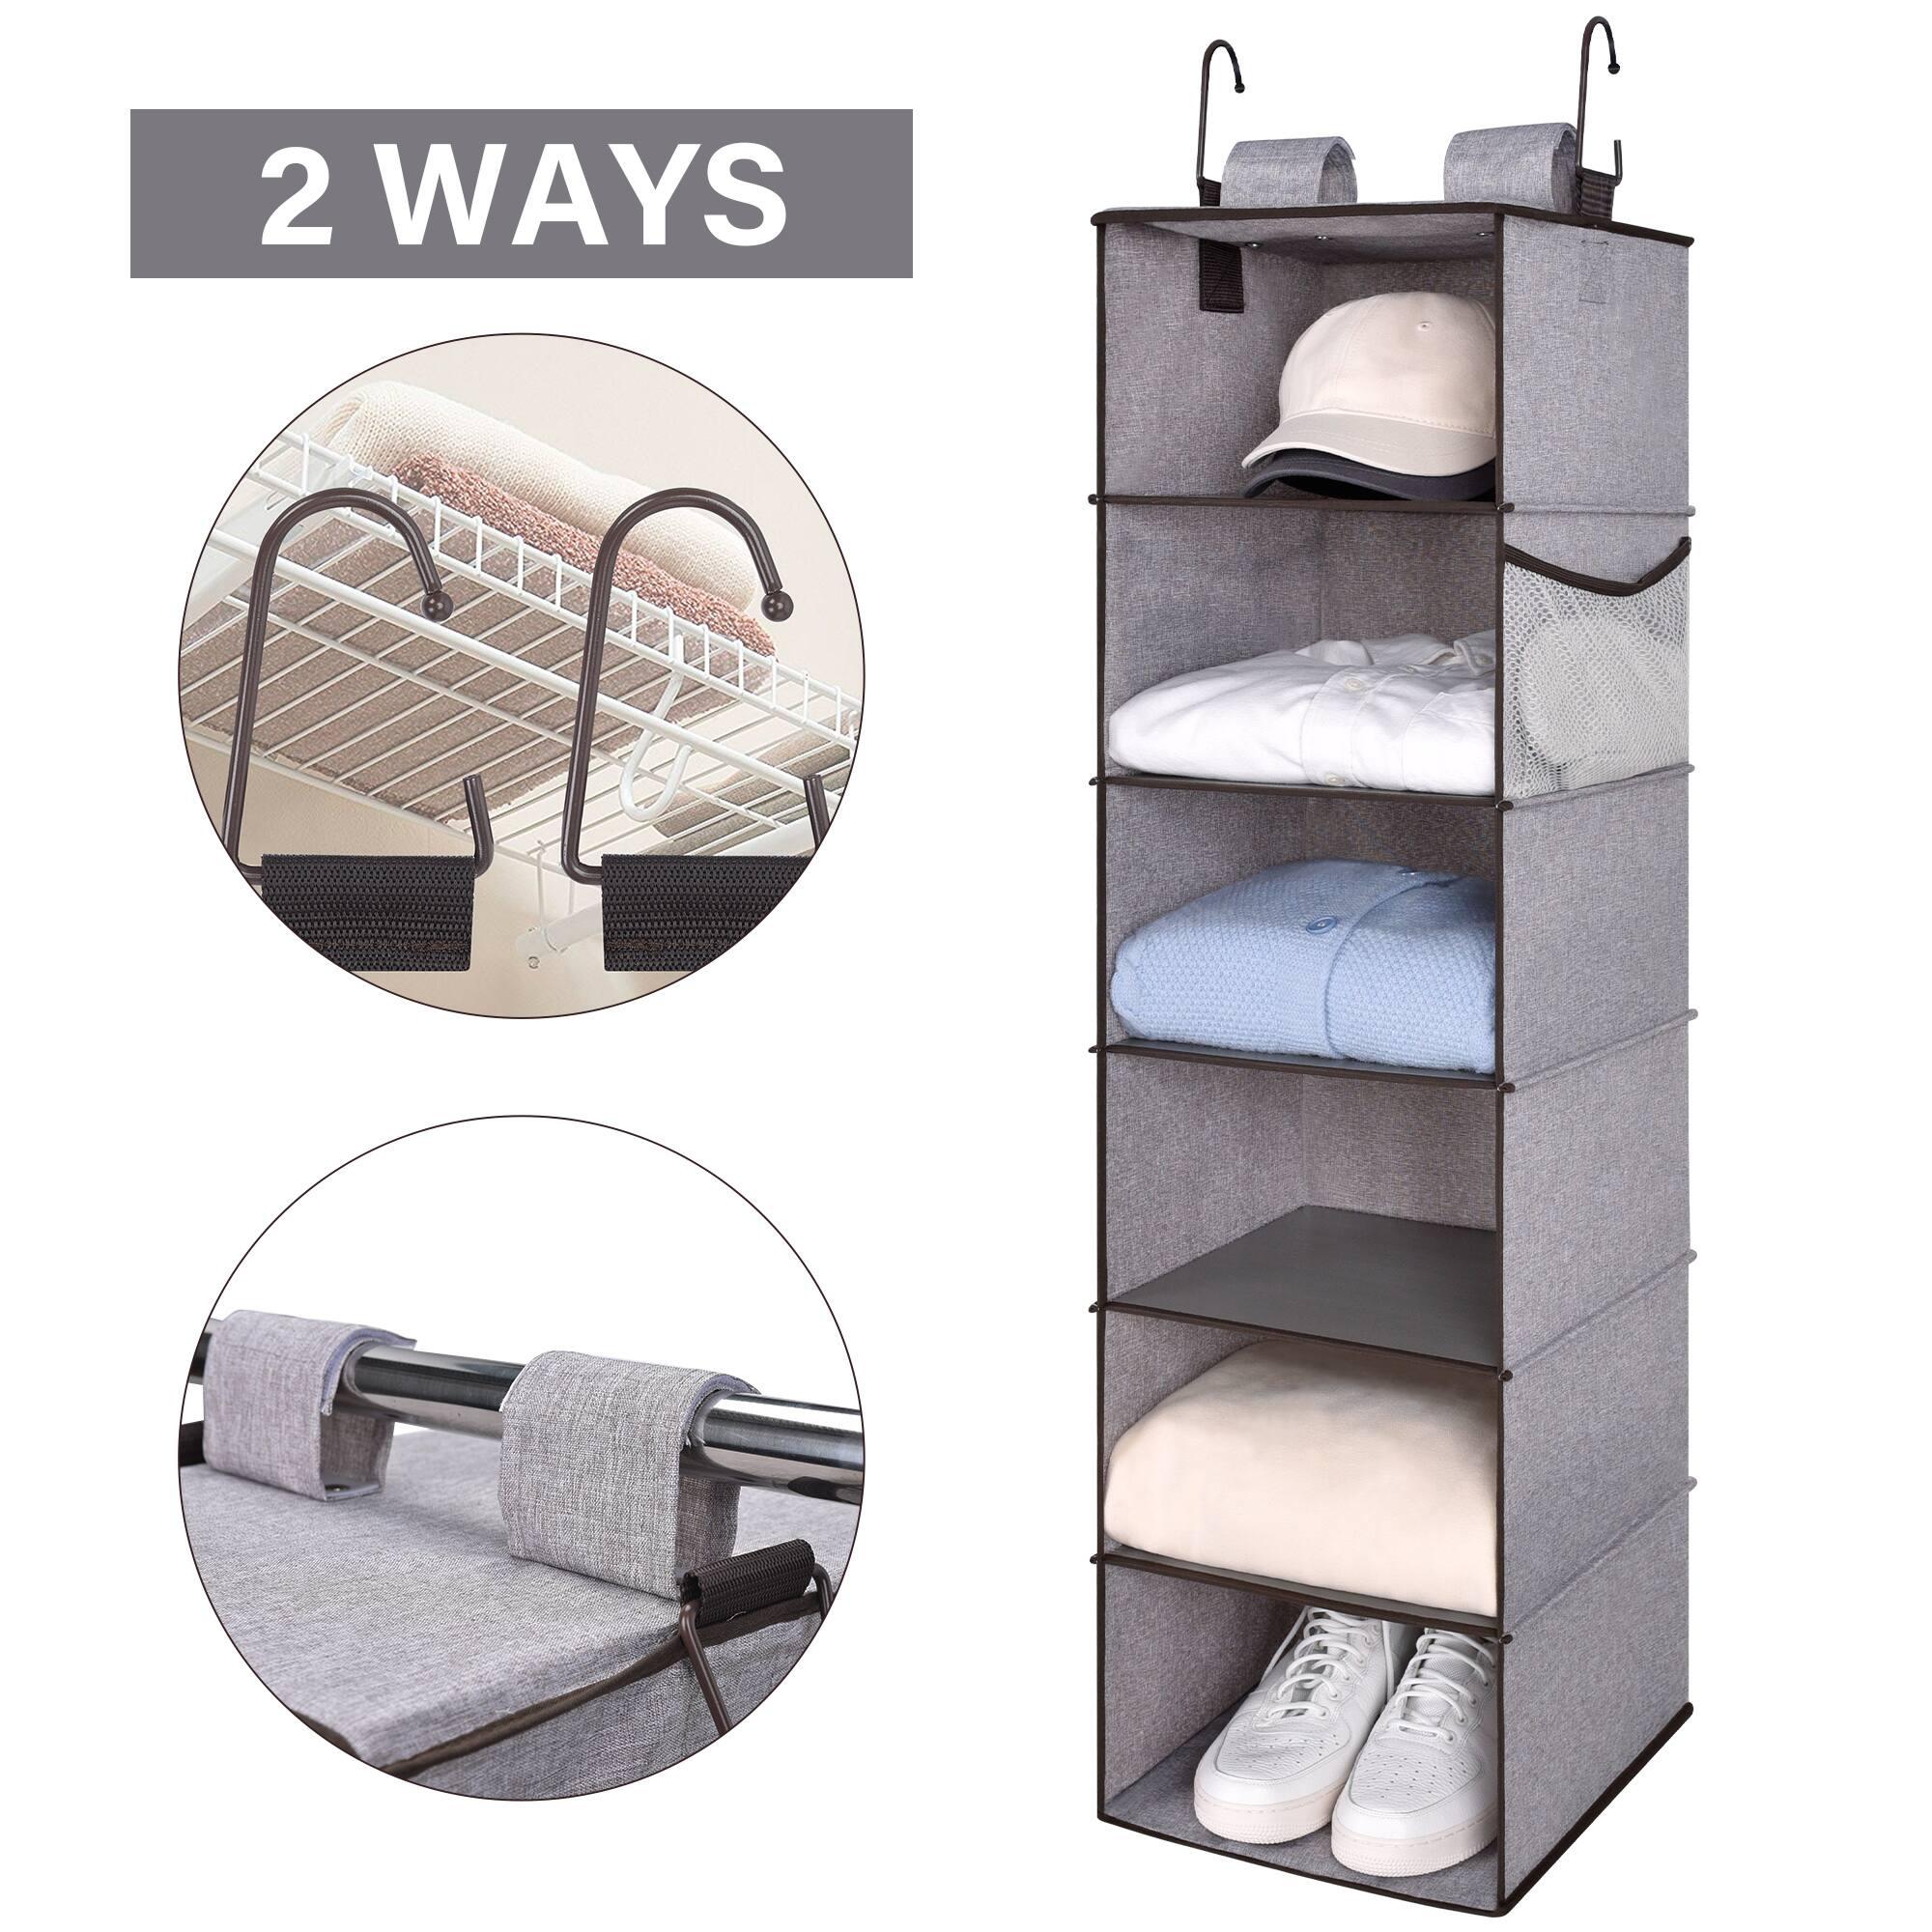 StorageWorks 6-Shelf Hanging Closet Organizer  $11.69 + Free Shipping